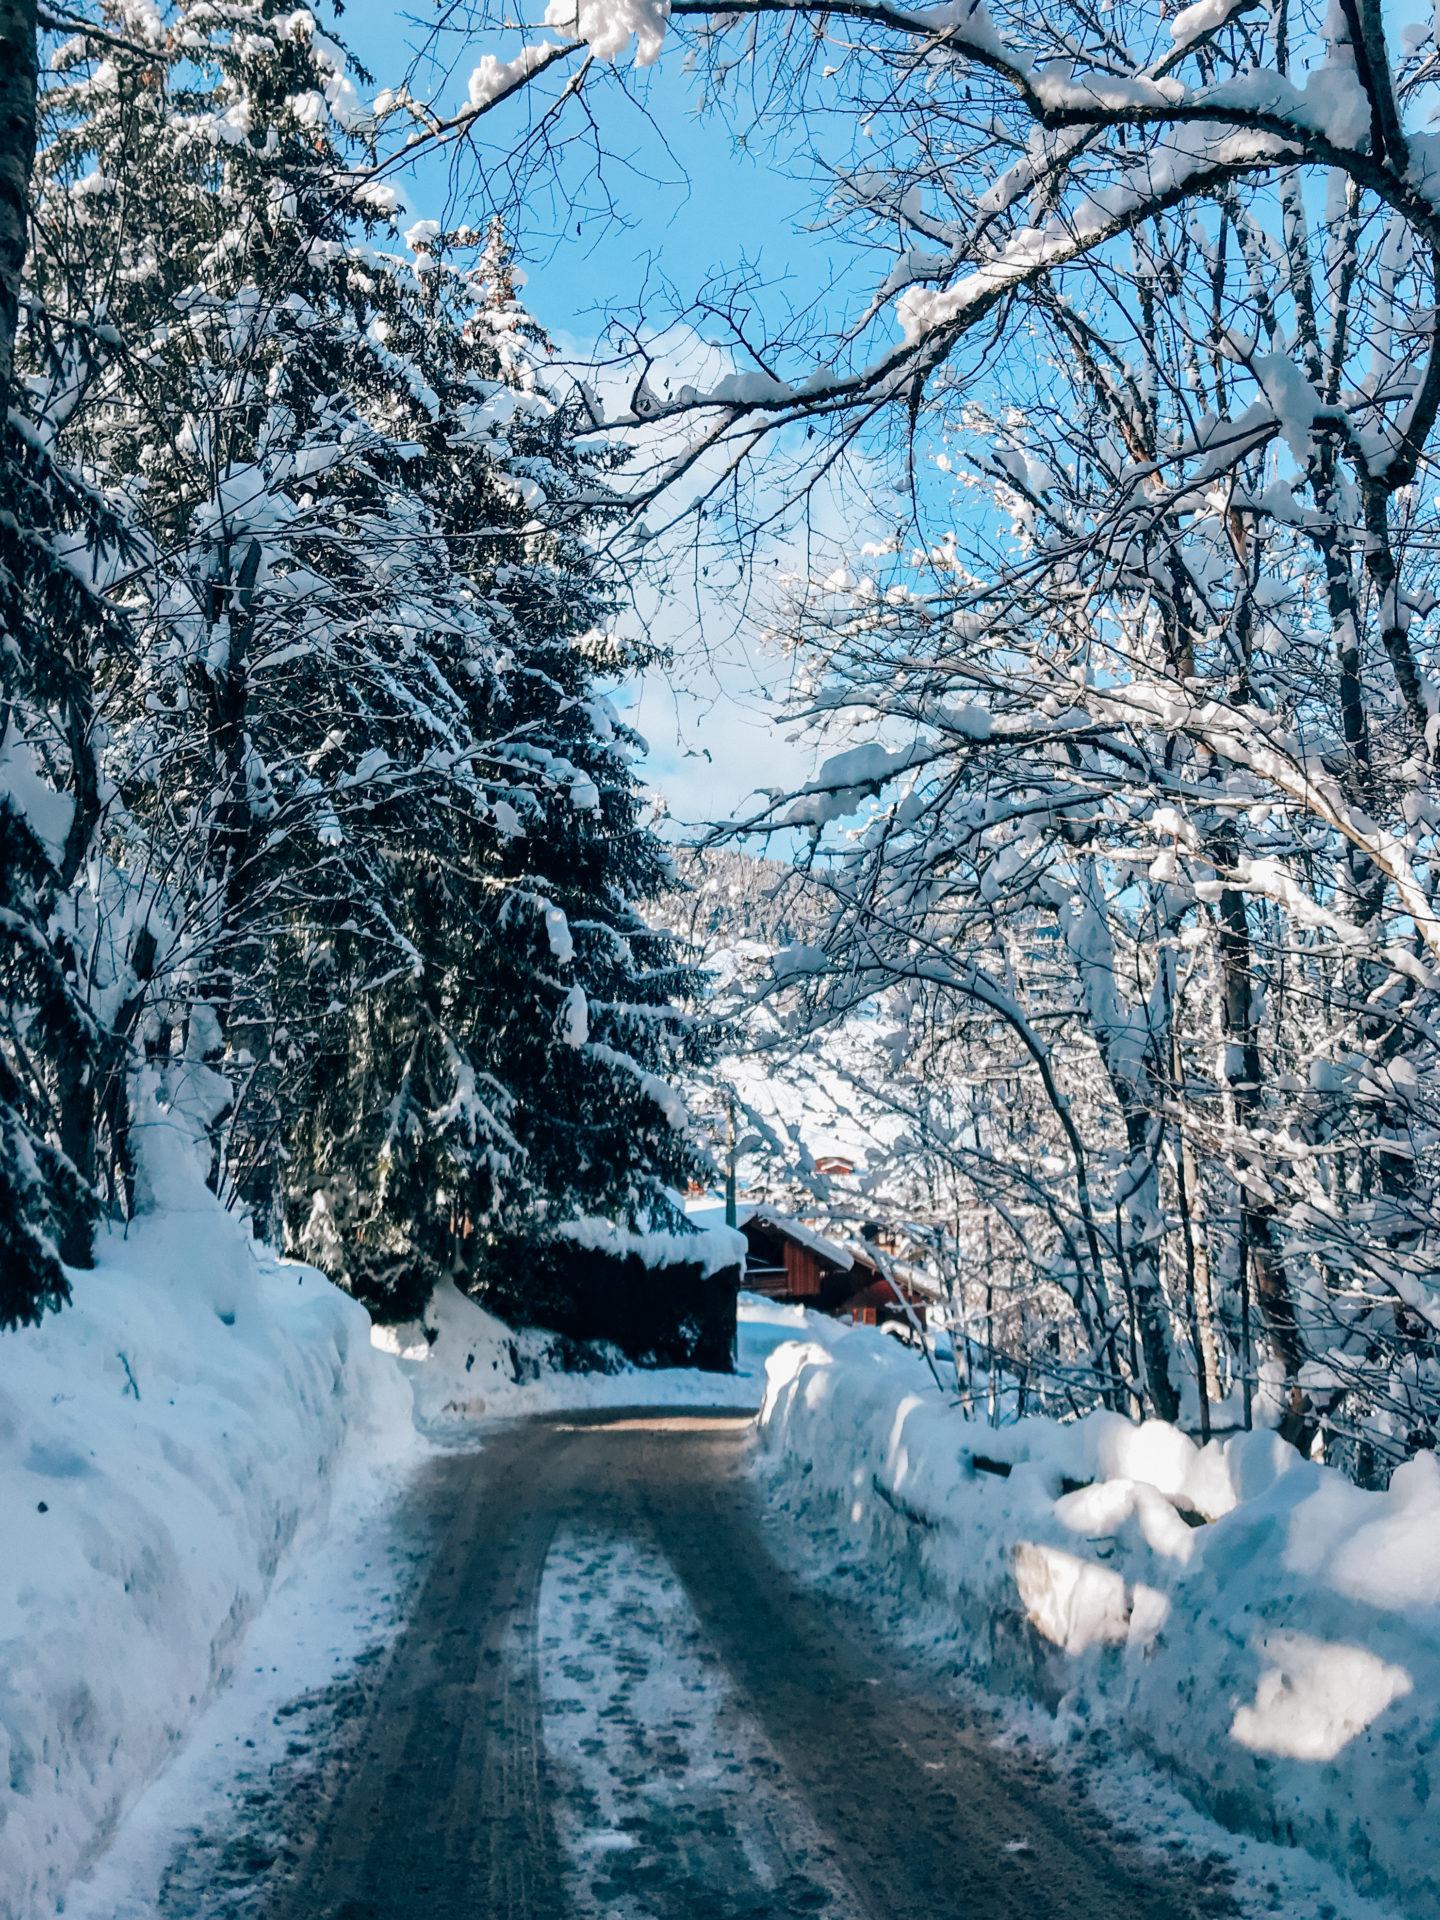 Snowy roads views